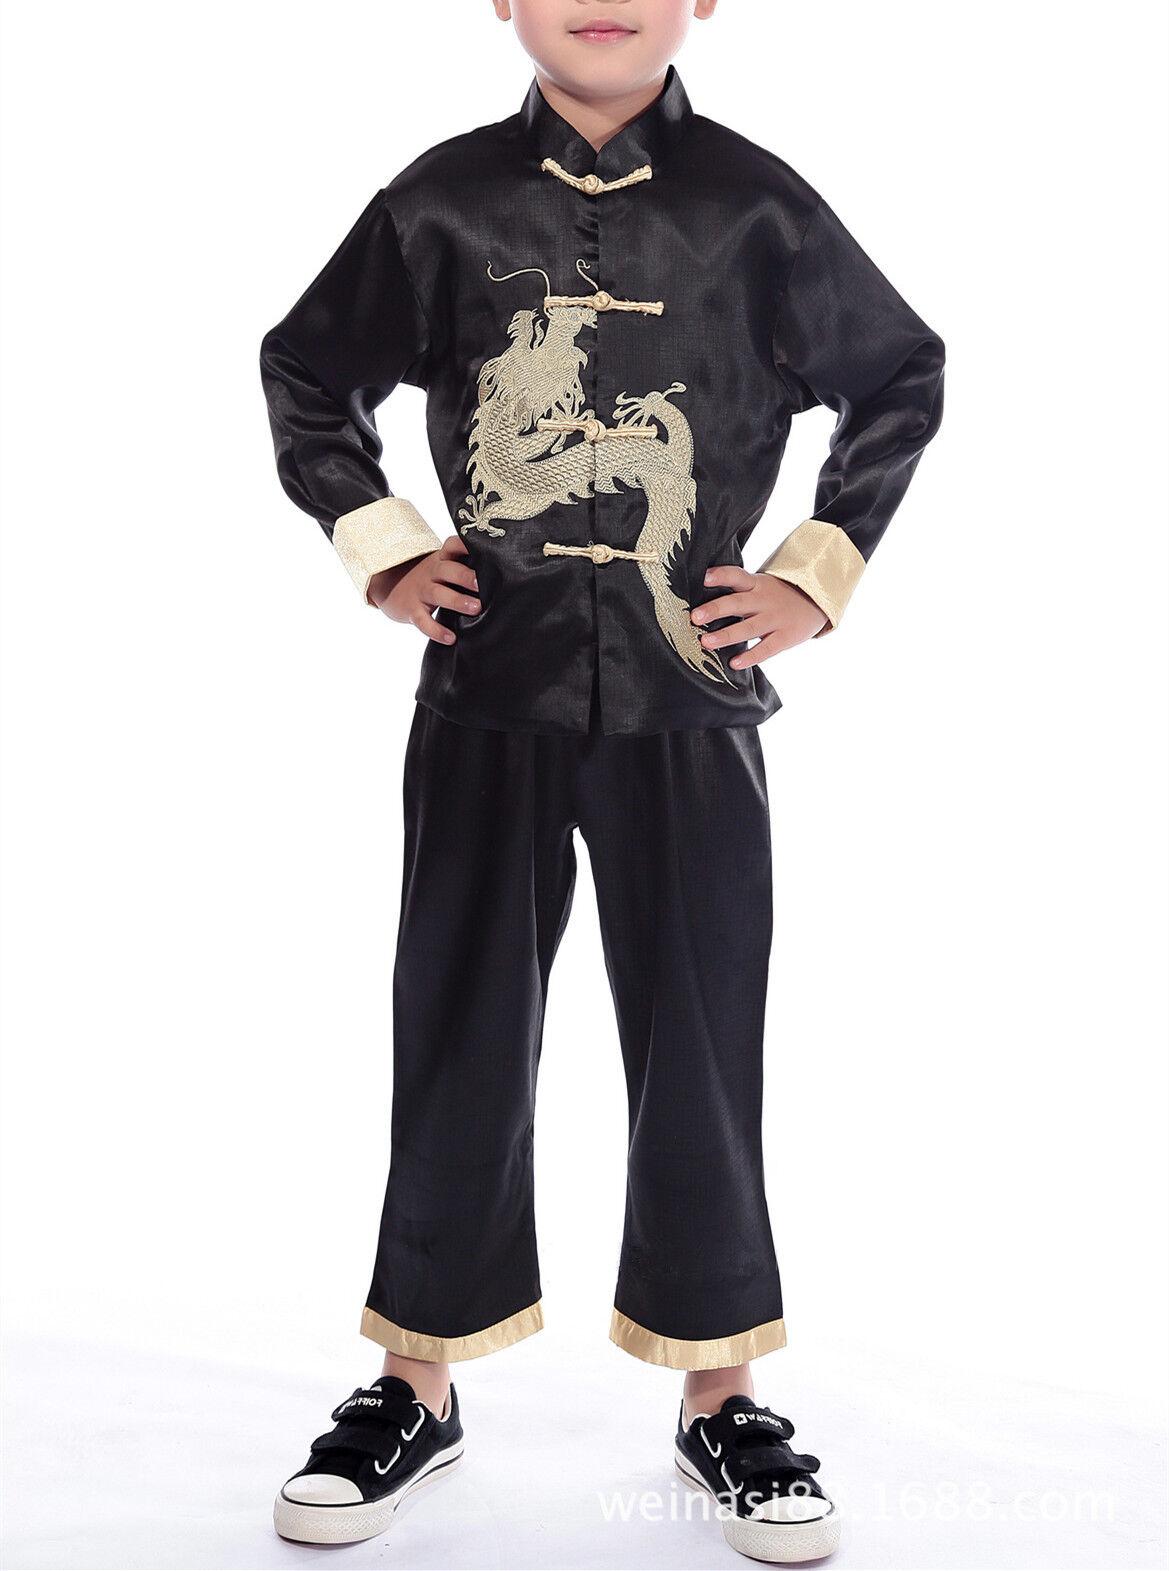 ee7e6a879c Nuevo chino Oriental para niños chicos oro Dragon Top Troushers Set pijama  chboy3